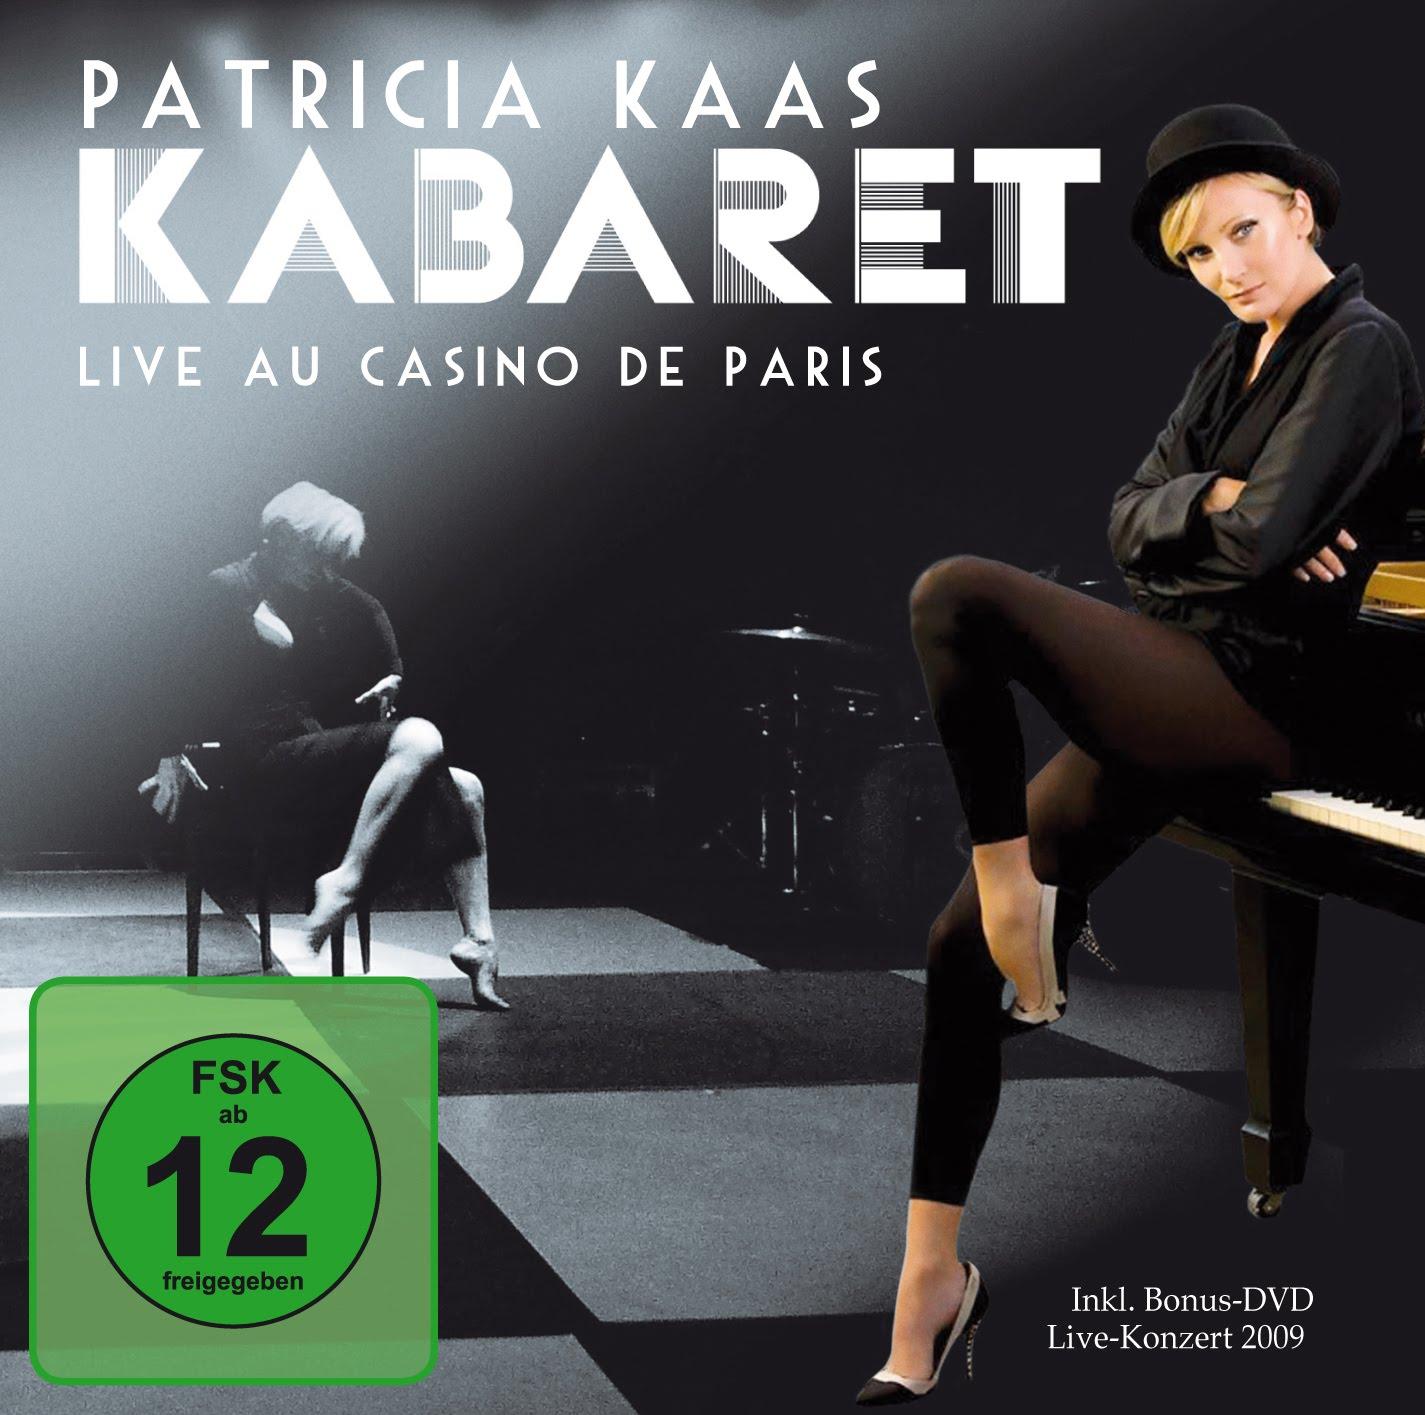 http://1.bp.blogspot.com/_xkNRWKDLXEo/SxKofJ3QsII/AAAAAAAAAMk/KP5Ep4KHn5E/s1600/Patricia+Kaas+-+Kabaret+-+Cover.jpg